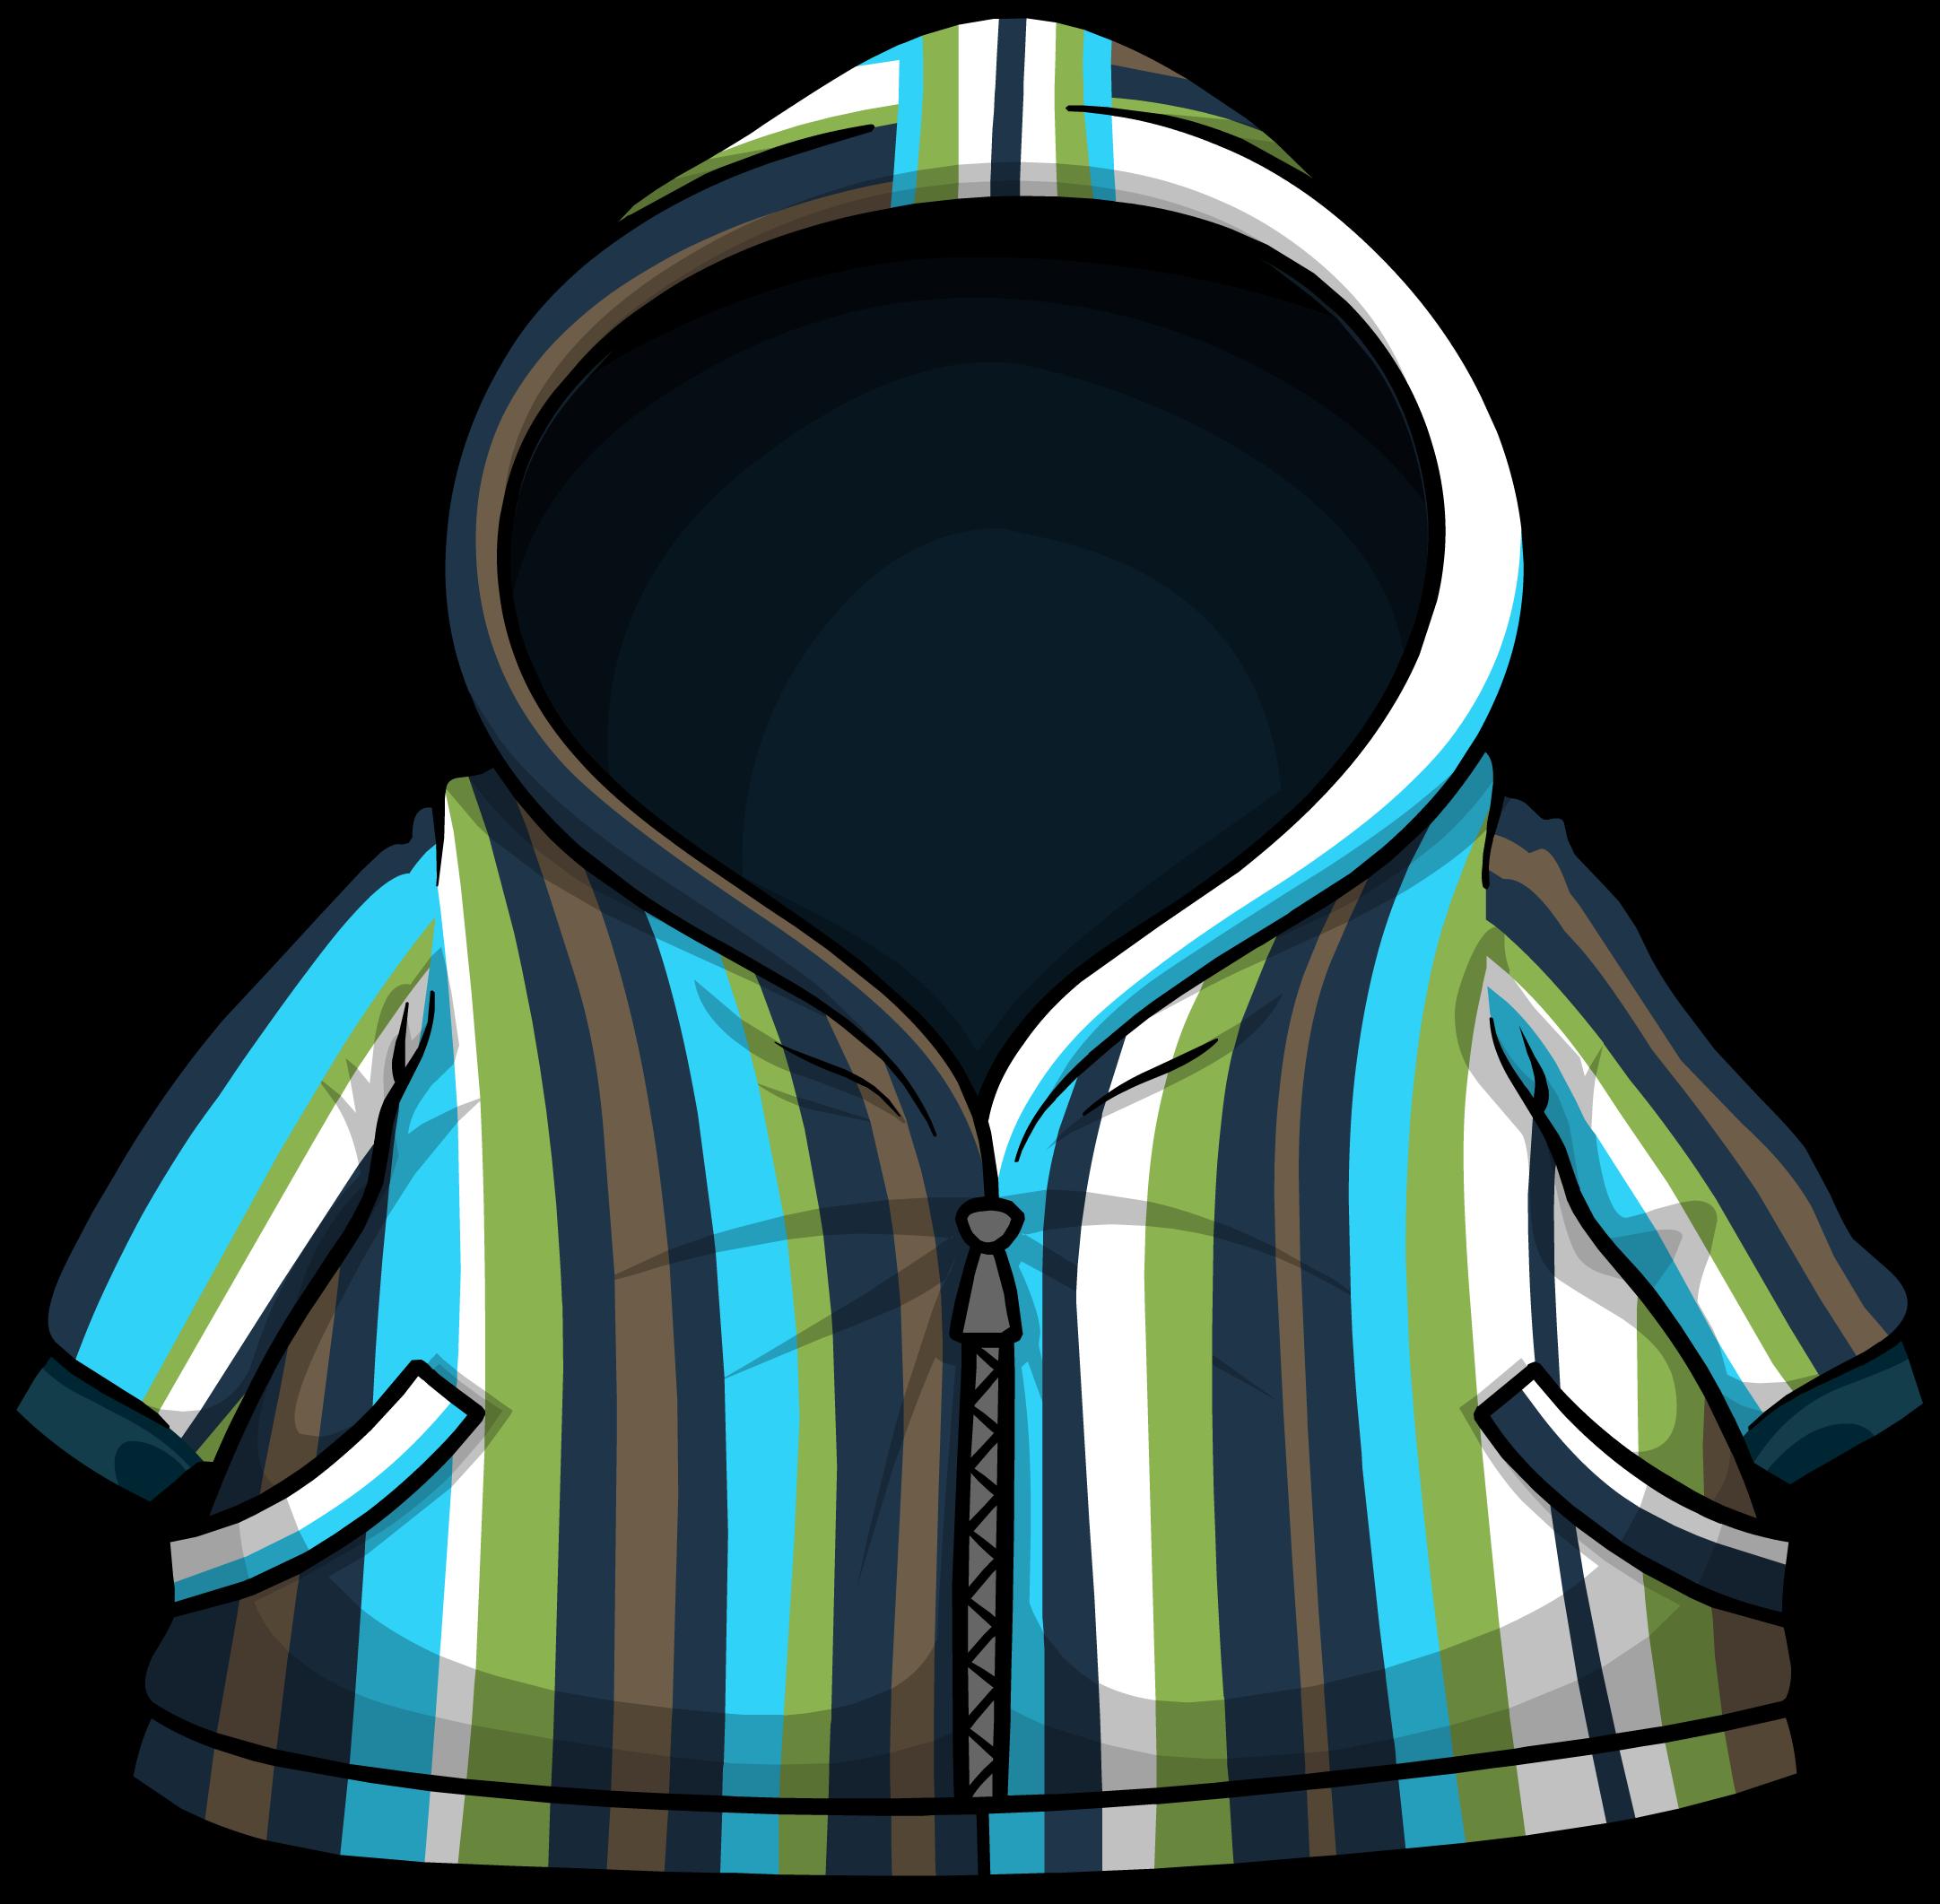 Blue Striped Raincoat